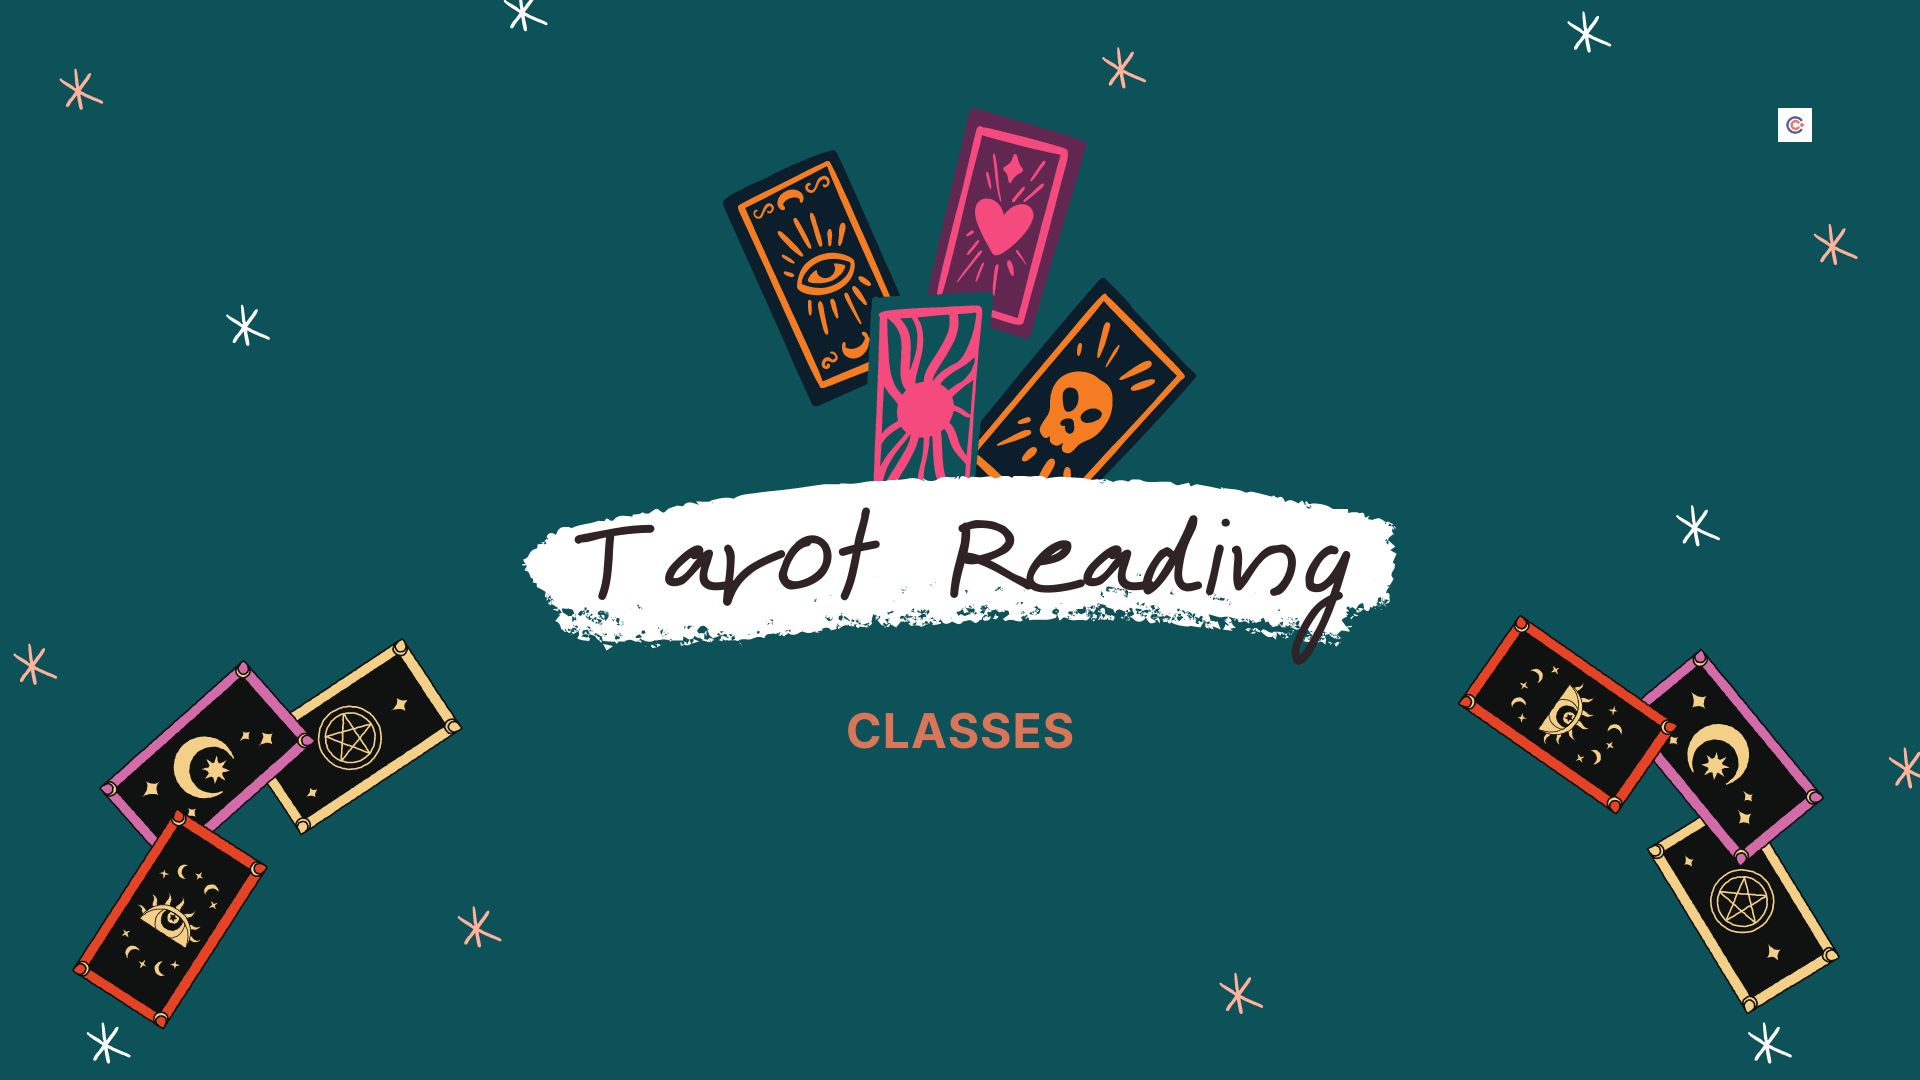 5 Best Tarot Reading Classes - Learn Tarot Reading Online